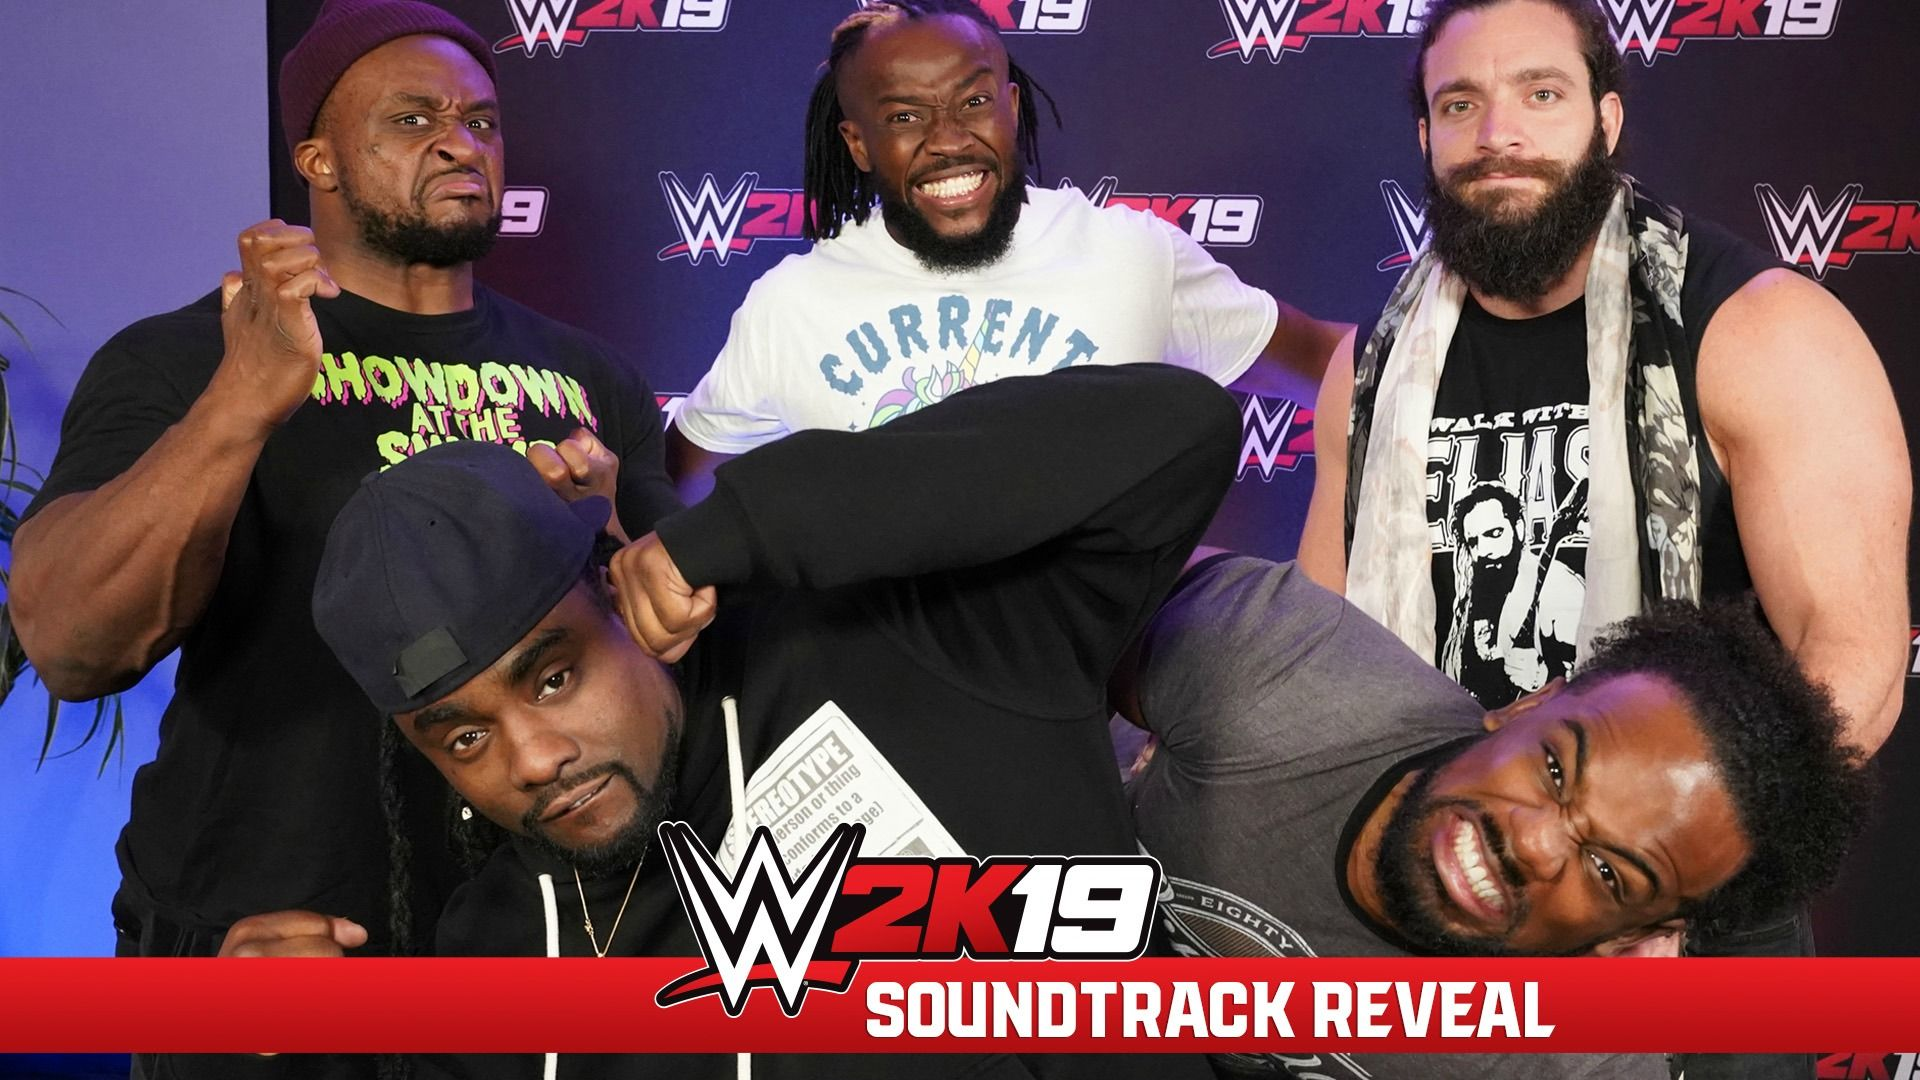 WWE Superstars Select The WWE 2K19 Soundtrack